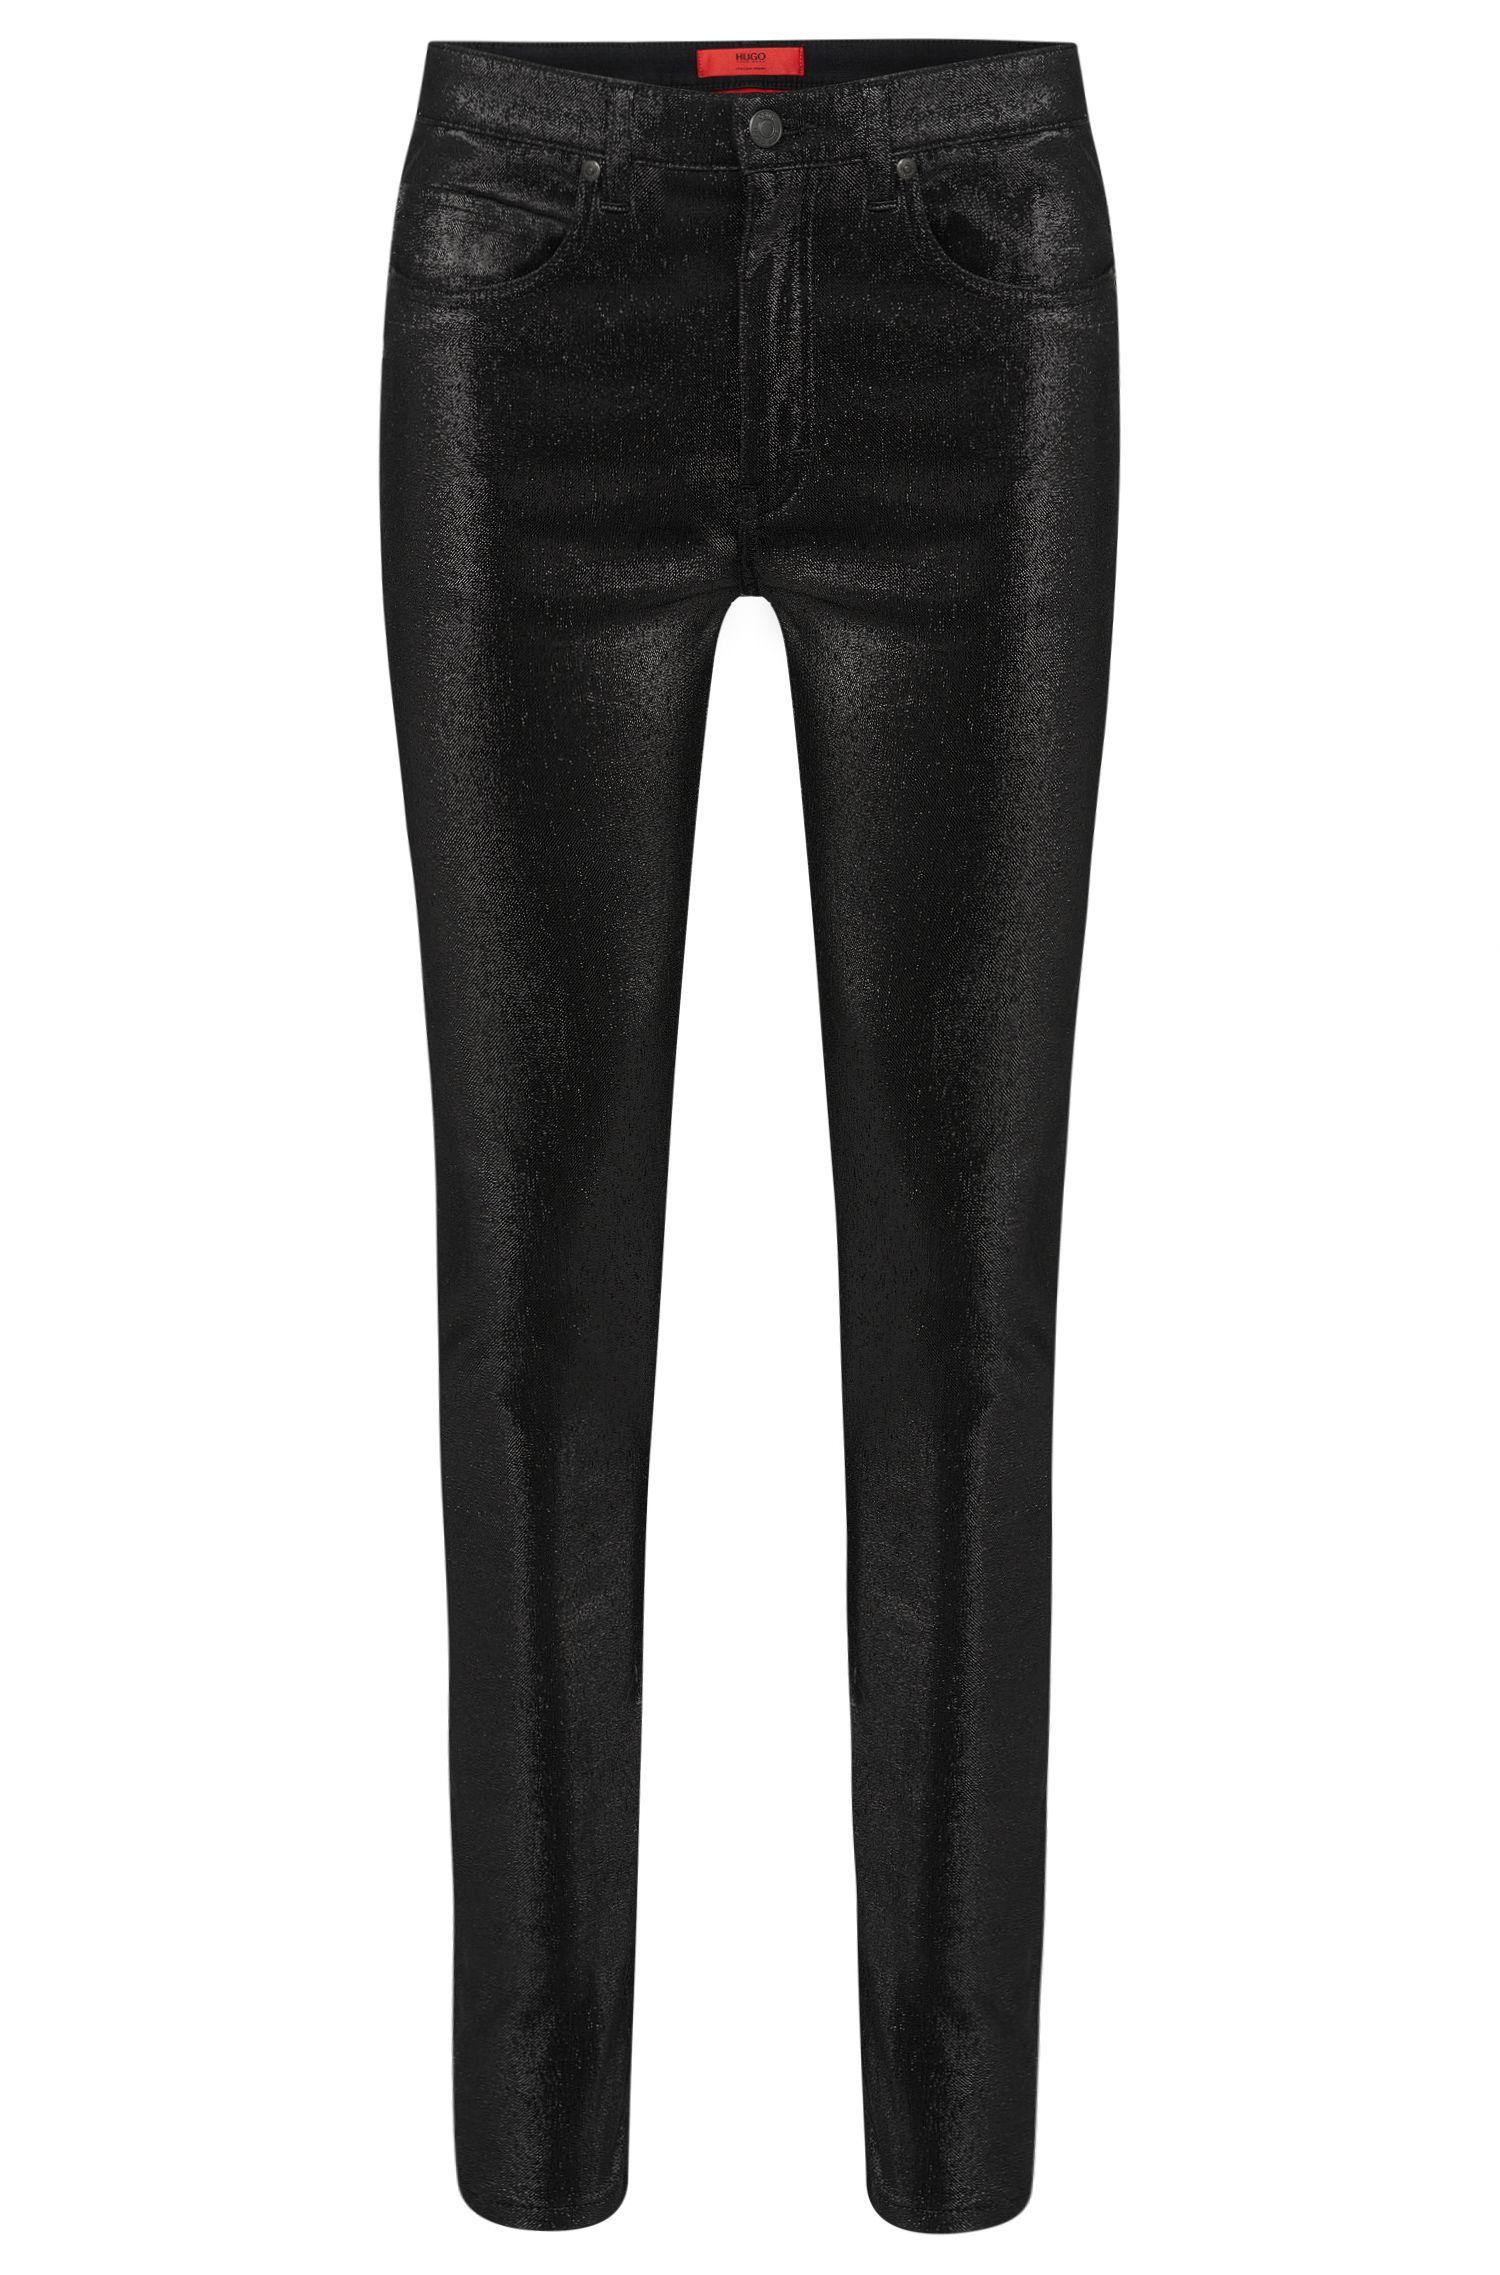 'HUGO 131' | Skinny Fit, 6.6 oz Stretch Cotton Blend Jeans